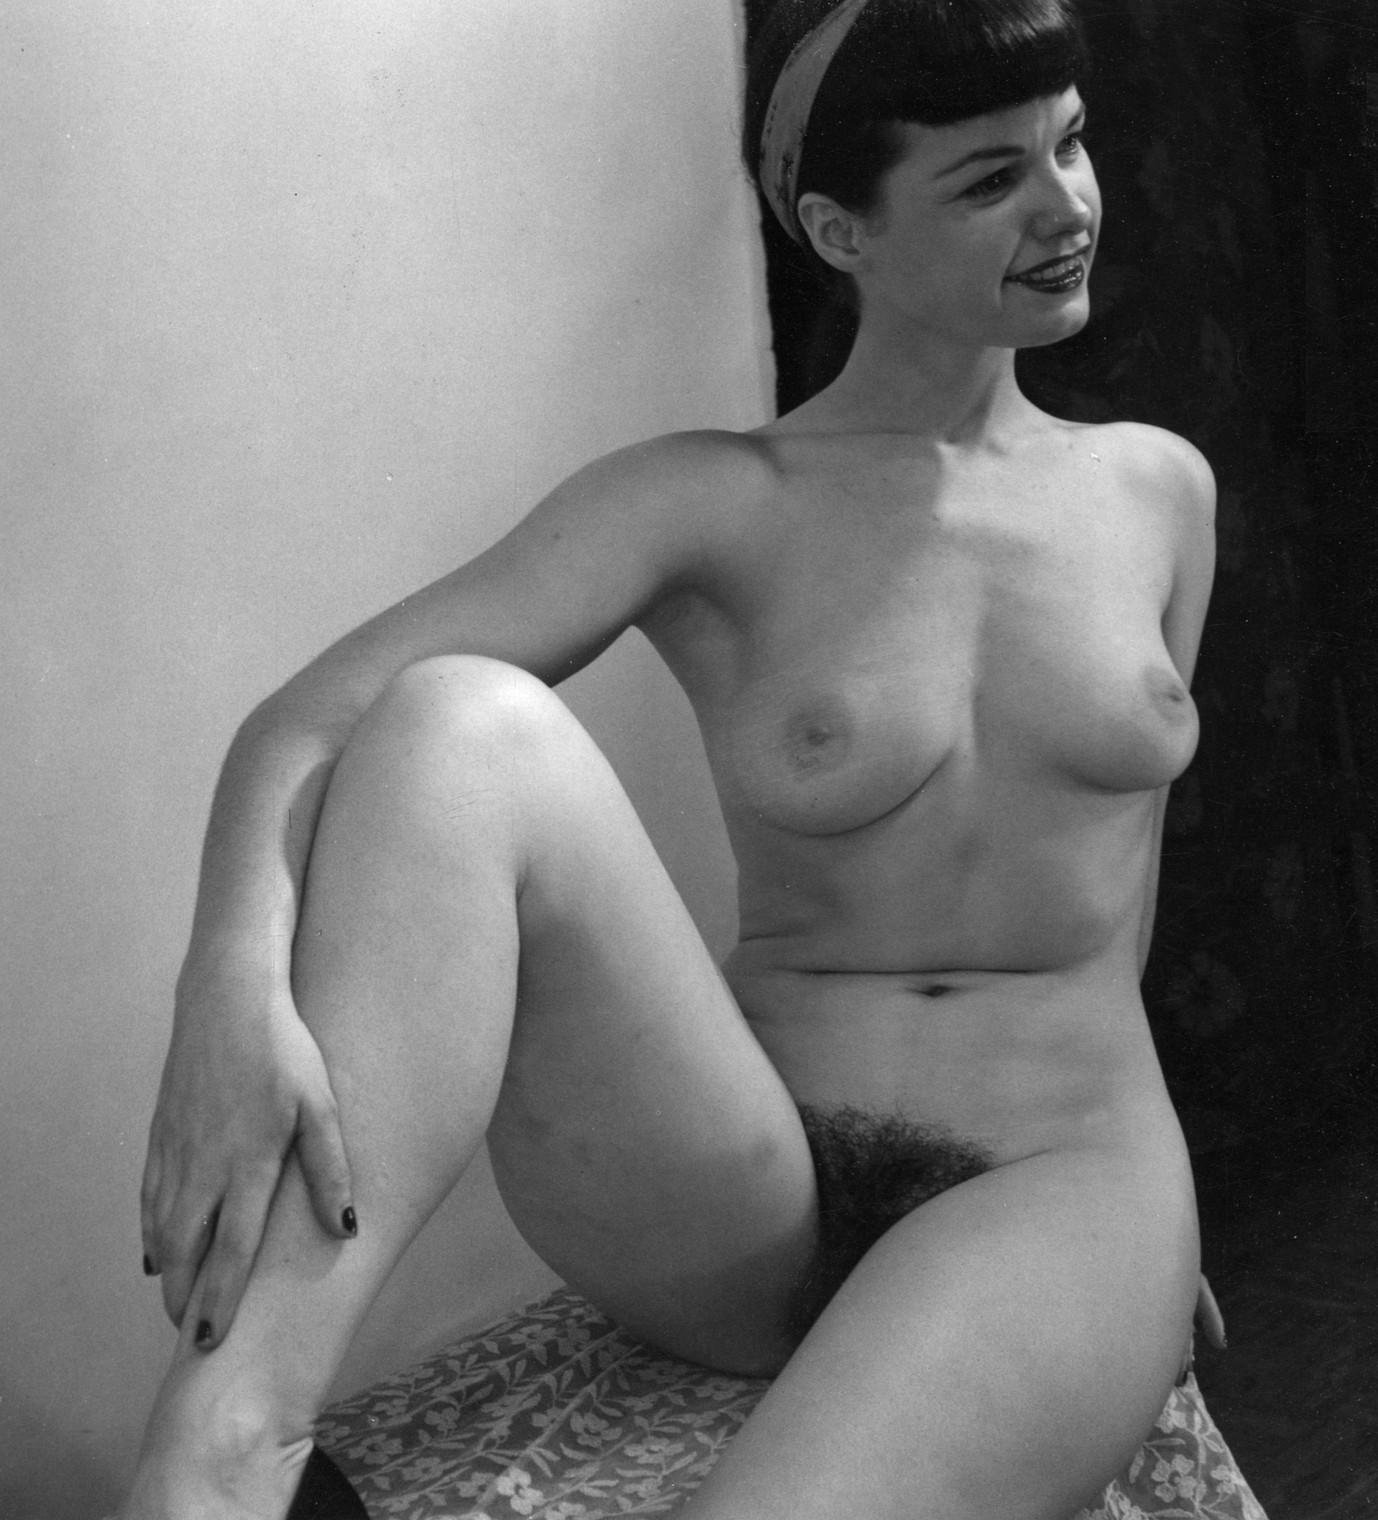 film eros anni 80 prezzi prostitute roma